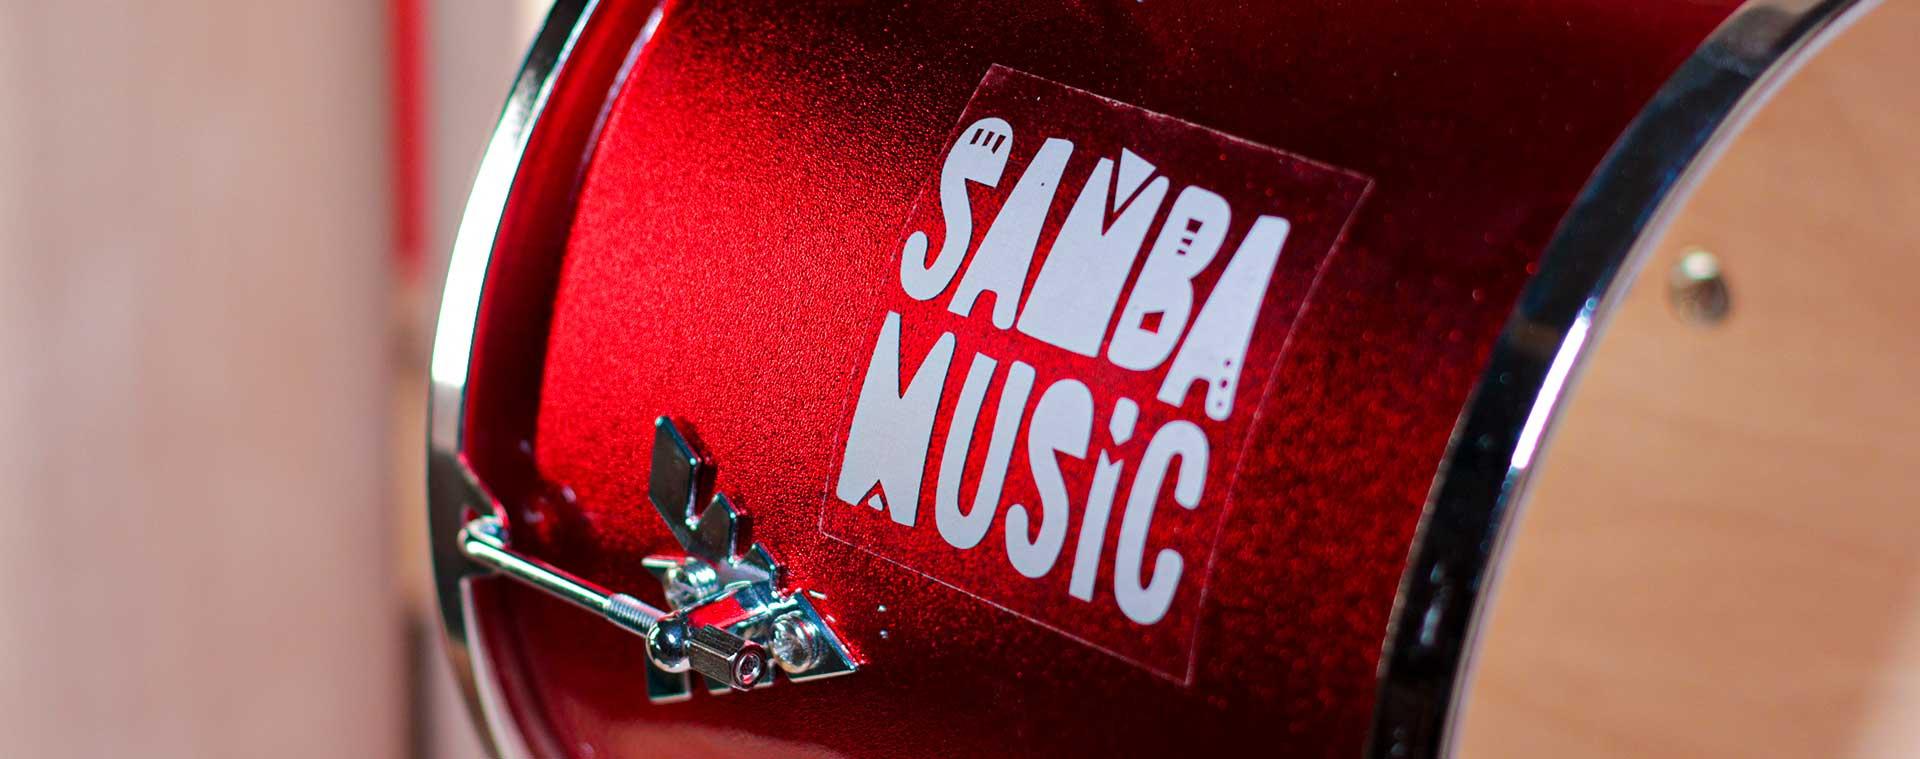 banner-sambamusic—link-2